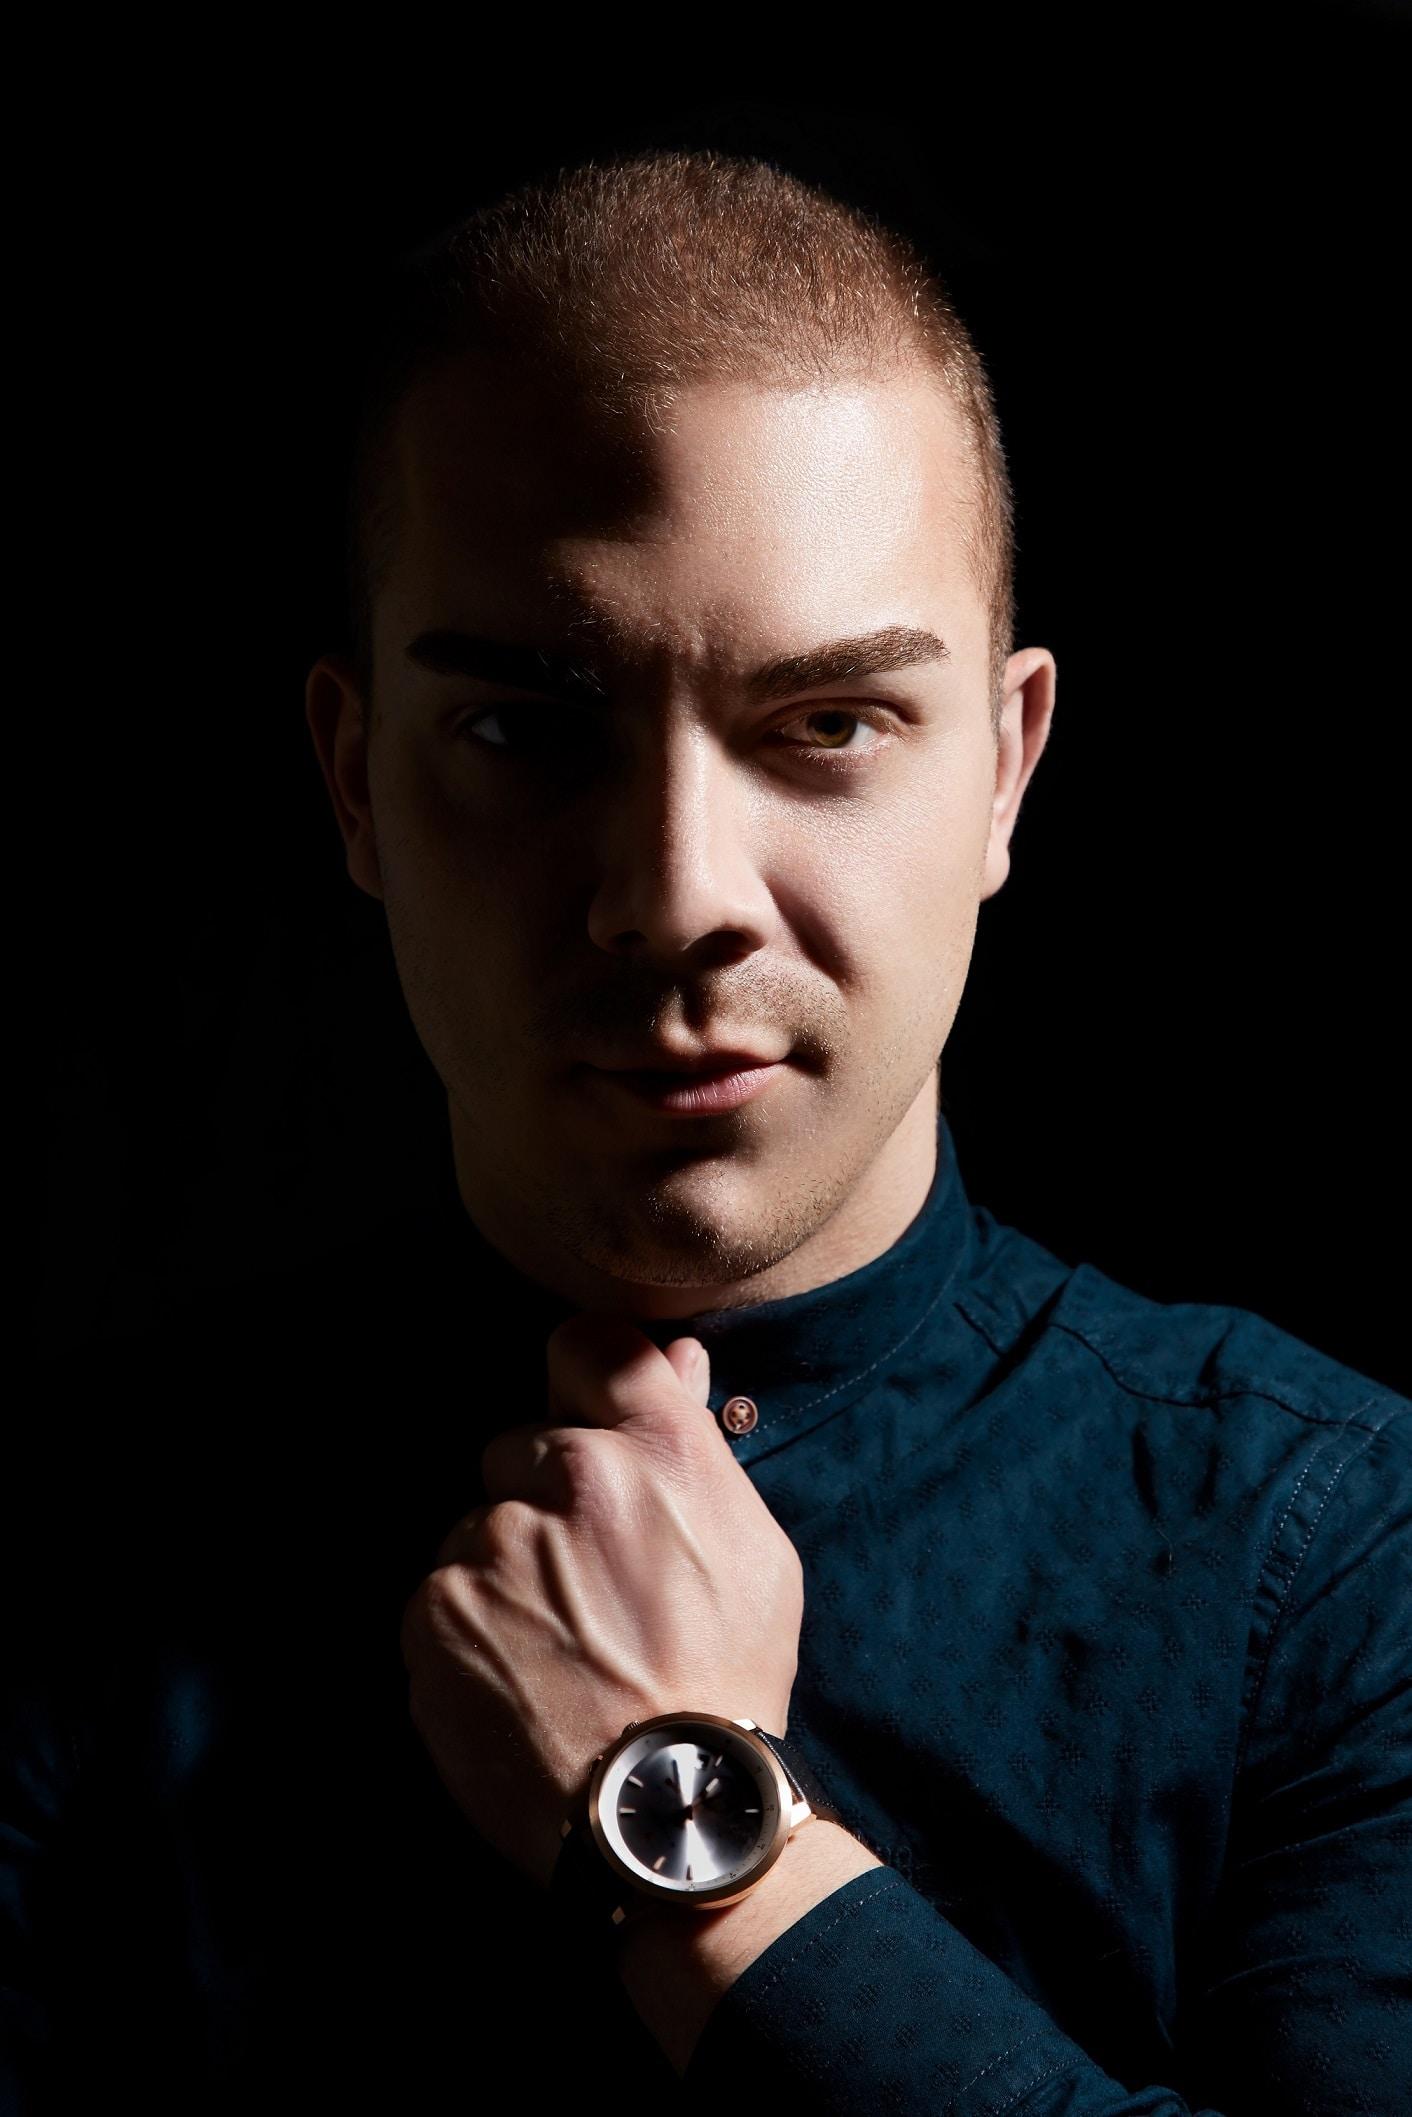 Go to Samuel Zlatarev's profile